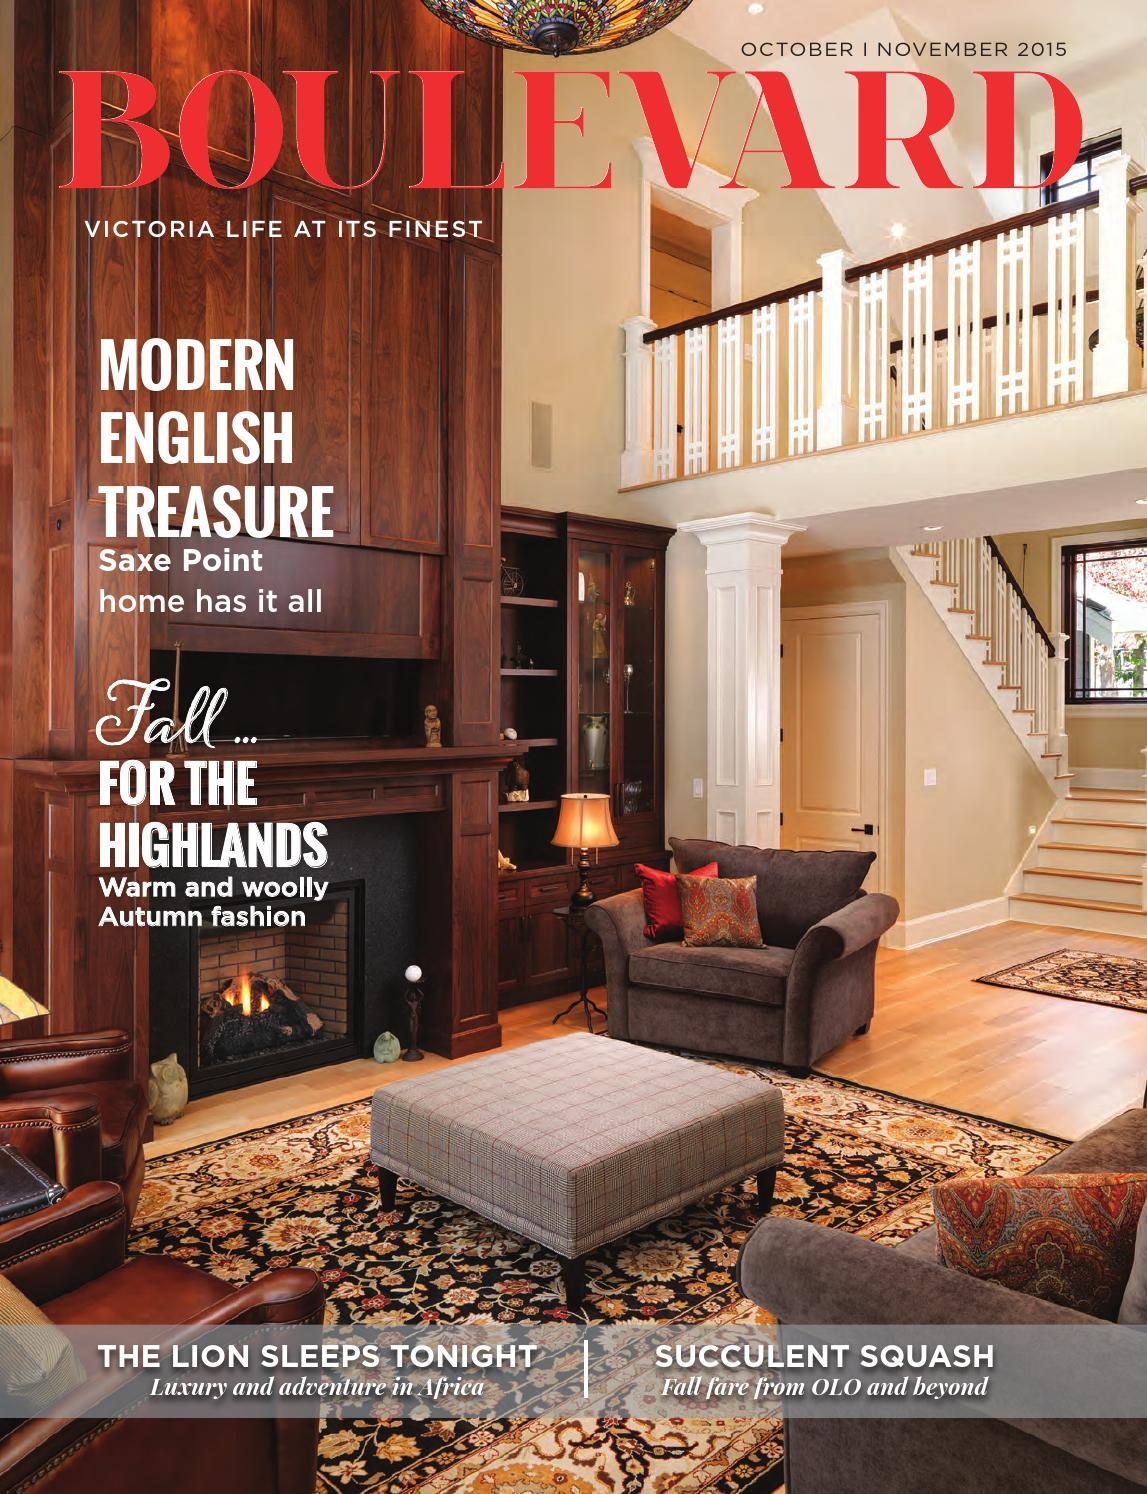 b1dfb47399 Boulevard Magazine - October   November 2015 Issue by Boulevard ...